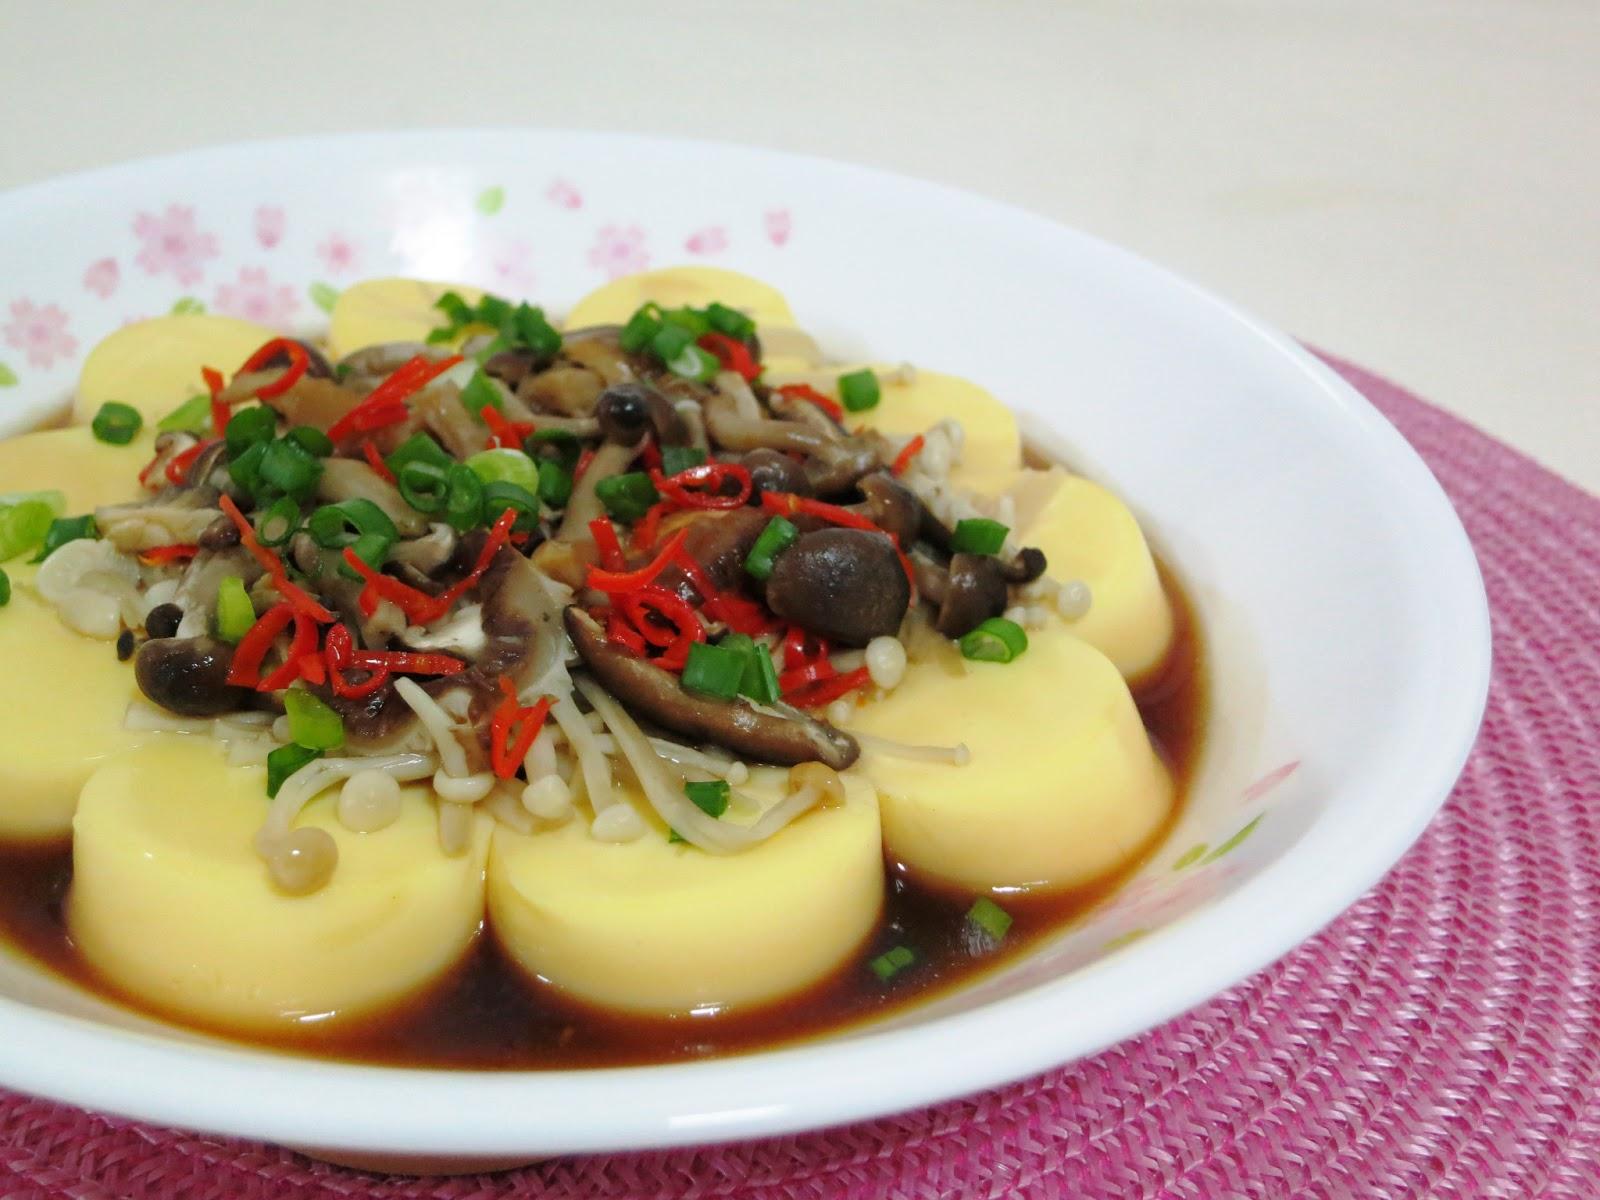 Pinkypiggu steamed egg tofu with assorted mushrooms recipe included steamed egg tofu with assorted mushrooms recipe included forumfinder Choice Image